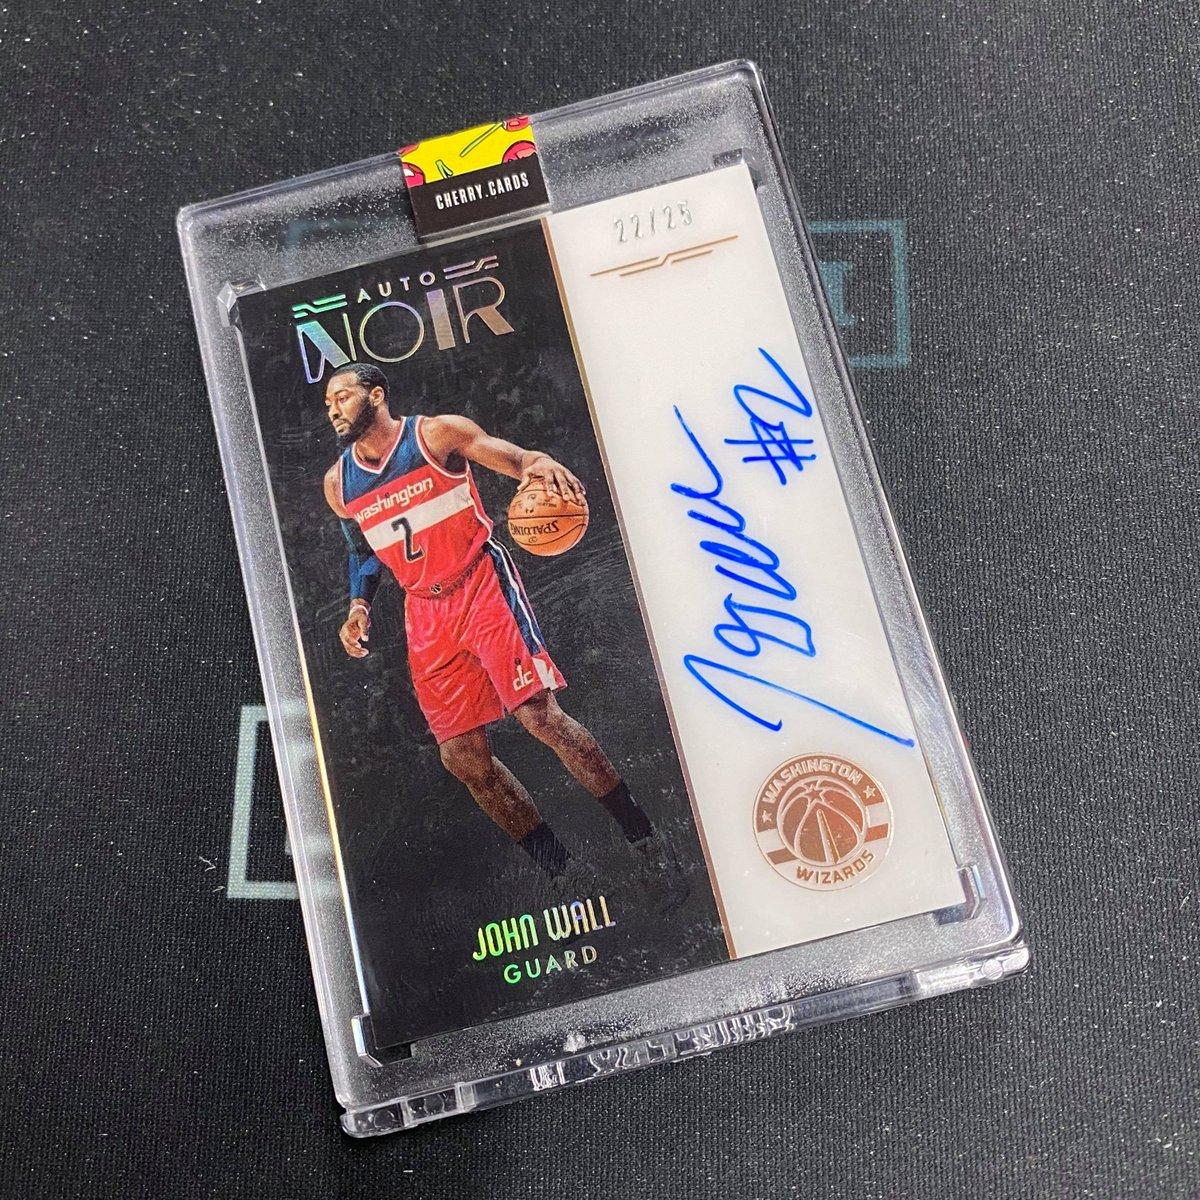 John Wall /25 #sportscards #whodoyoucollect #thehobby #johnwall #paniniamerica #groupbreaks #washingtonwizards #lebron #rookiecards #kobe #autograph #casebreaks #basketballcards #球星卡 #籃球卡 #sportscardsforsale #hobbystore #cherrycards pic.twitter.com/S7wvFKUYWn